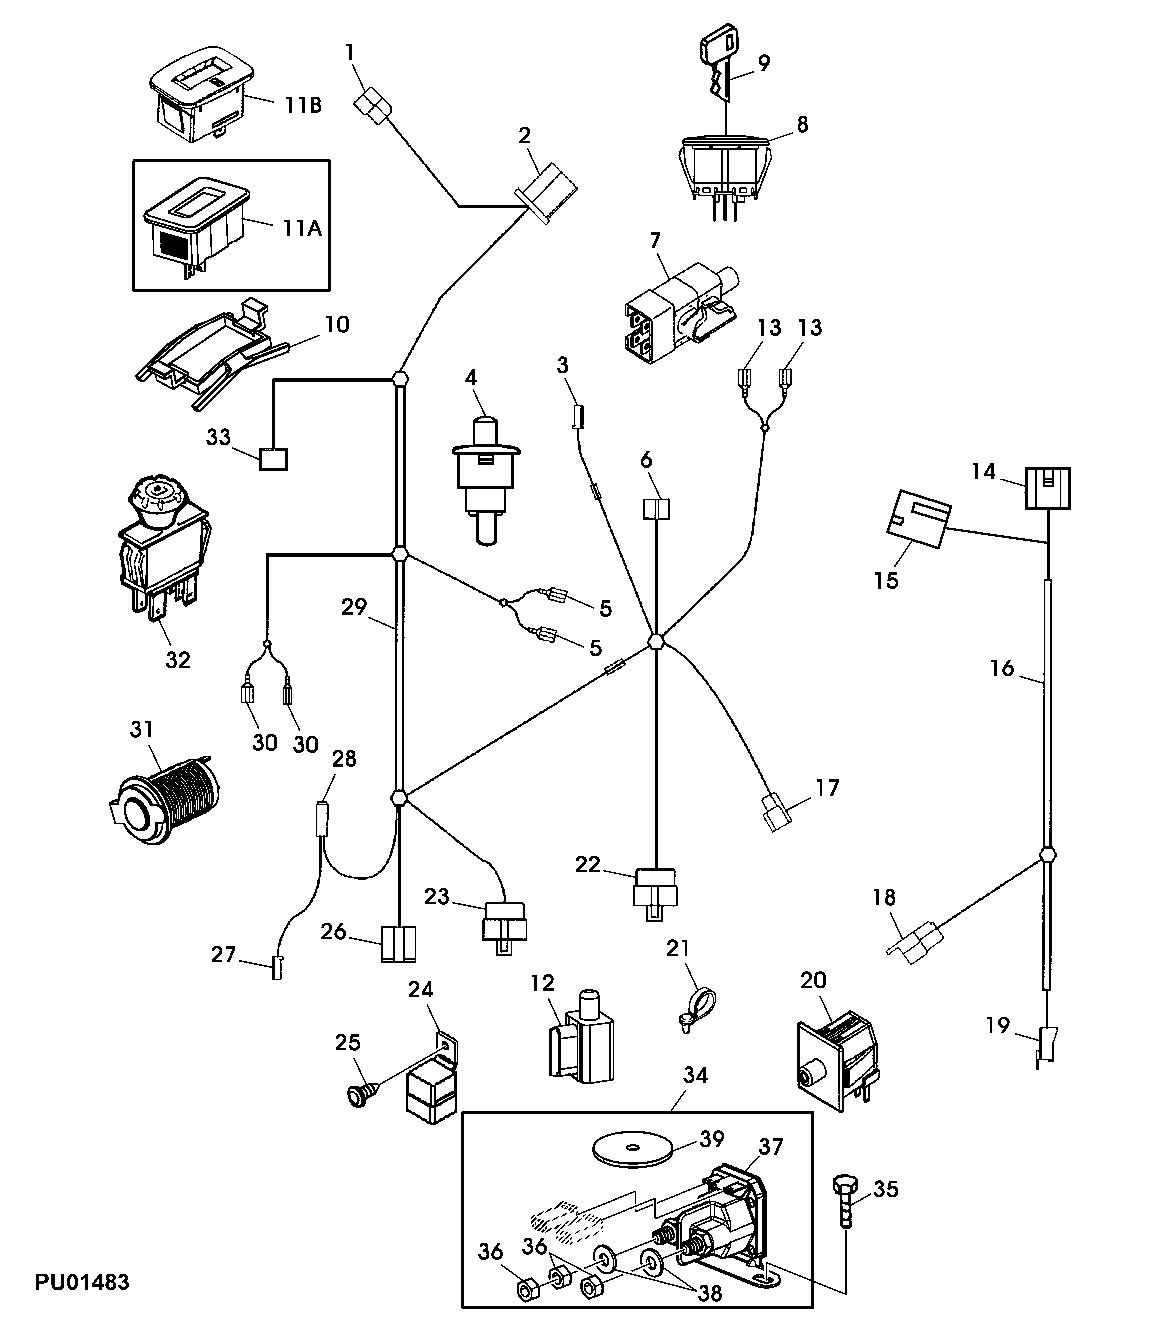 muncie pto pressure switch wiring diagram anything wiring diagram